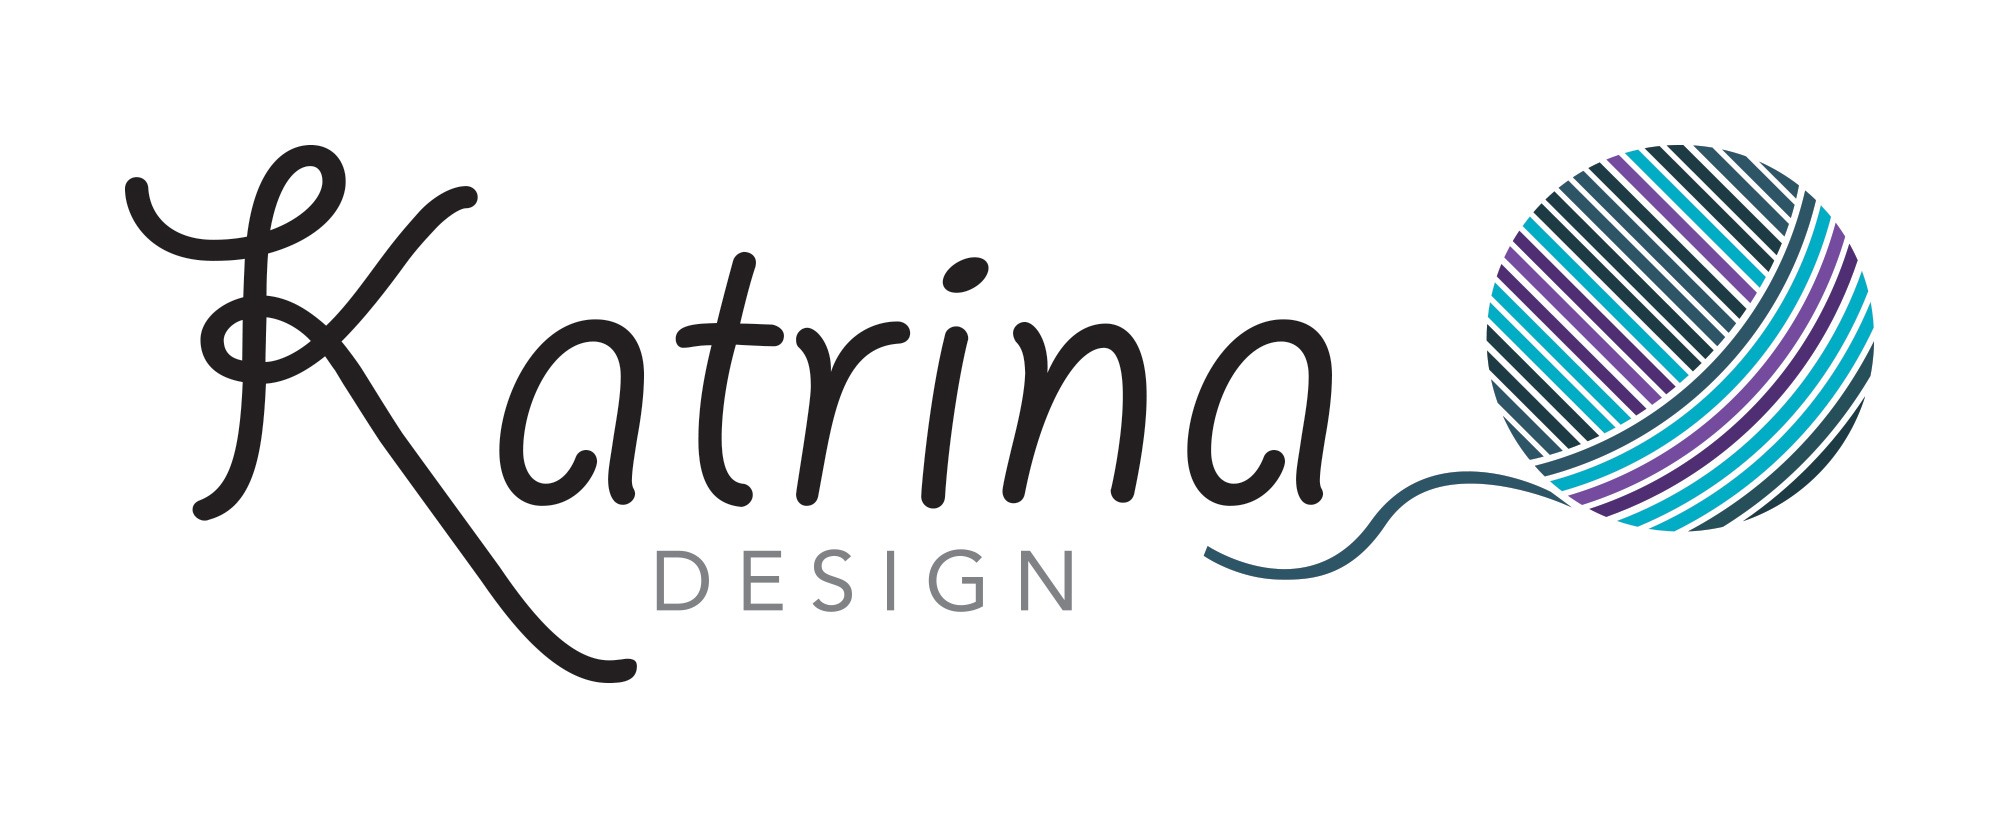 DesignKatrina